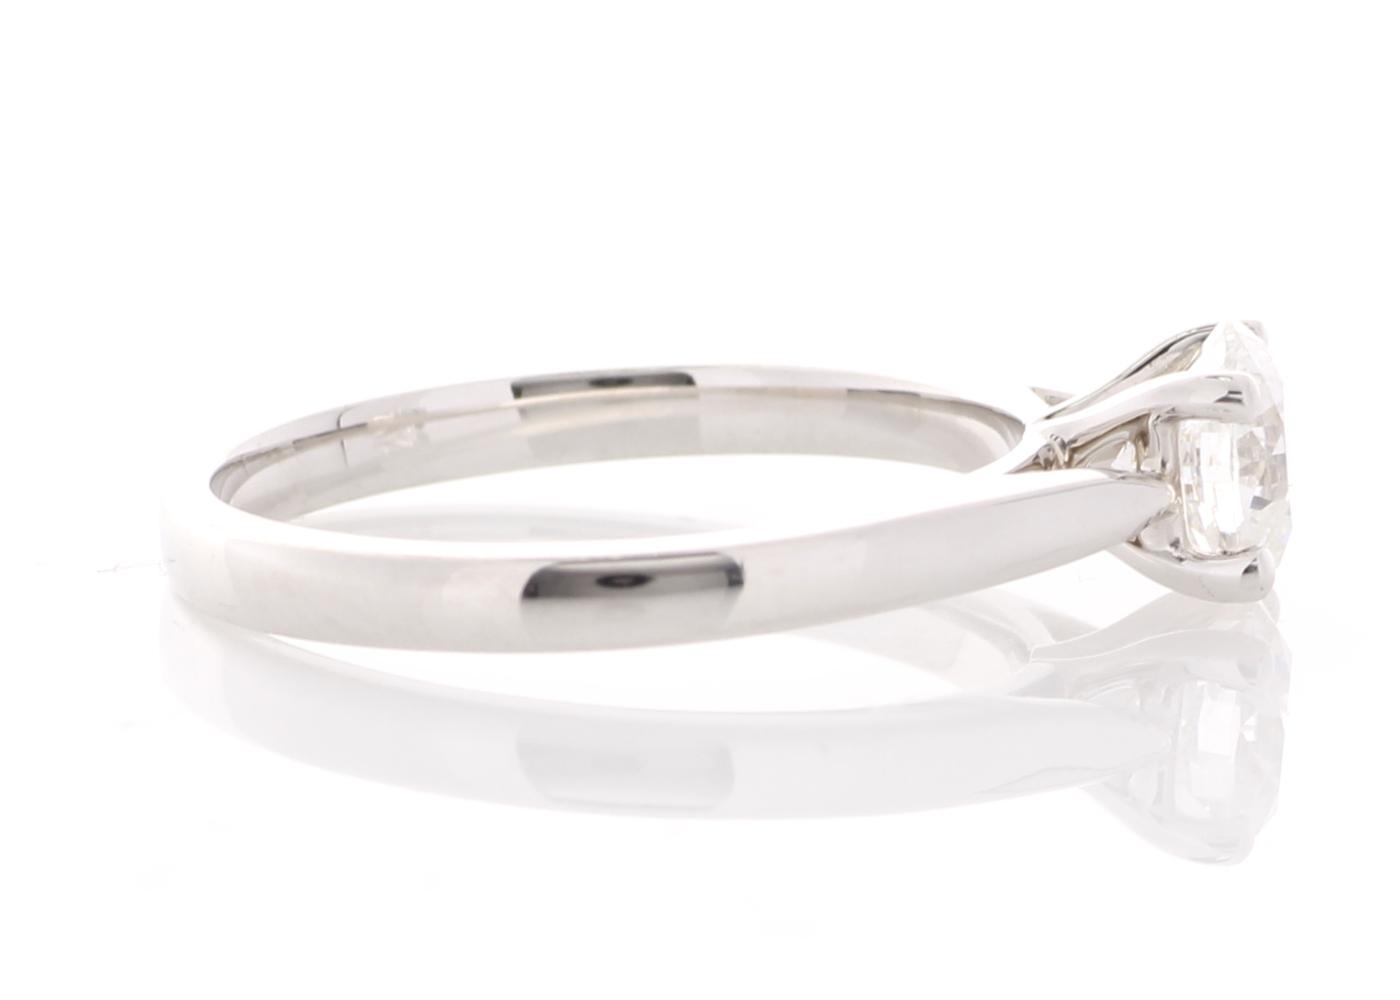 18ct White Gold Single Stone Prong Set Diamond Ring 0.73 Carats - Image 4 of 5